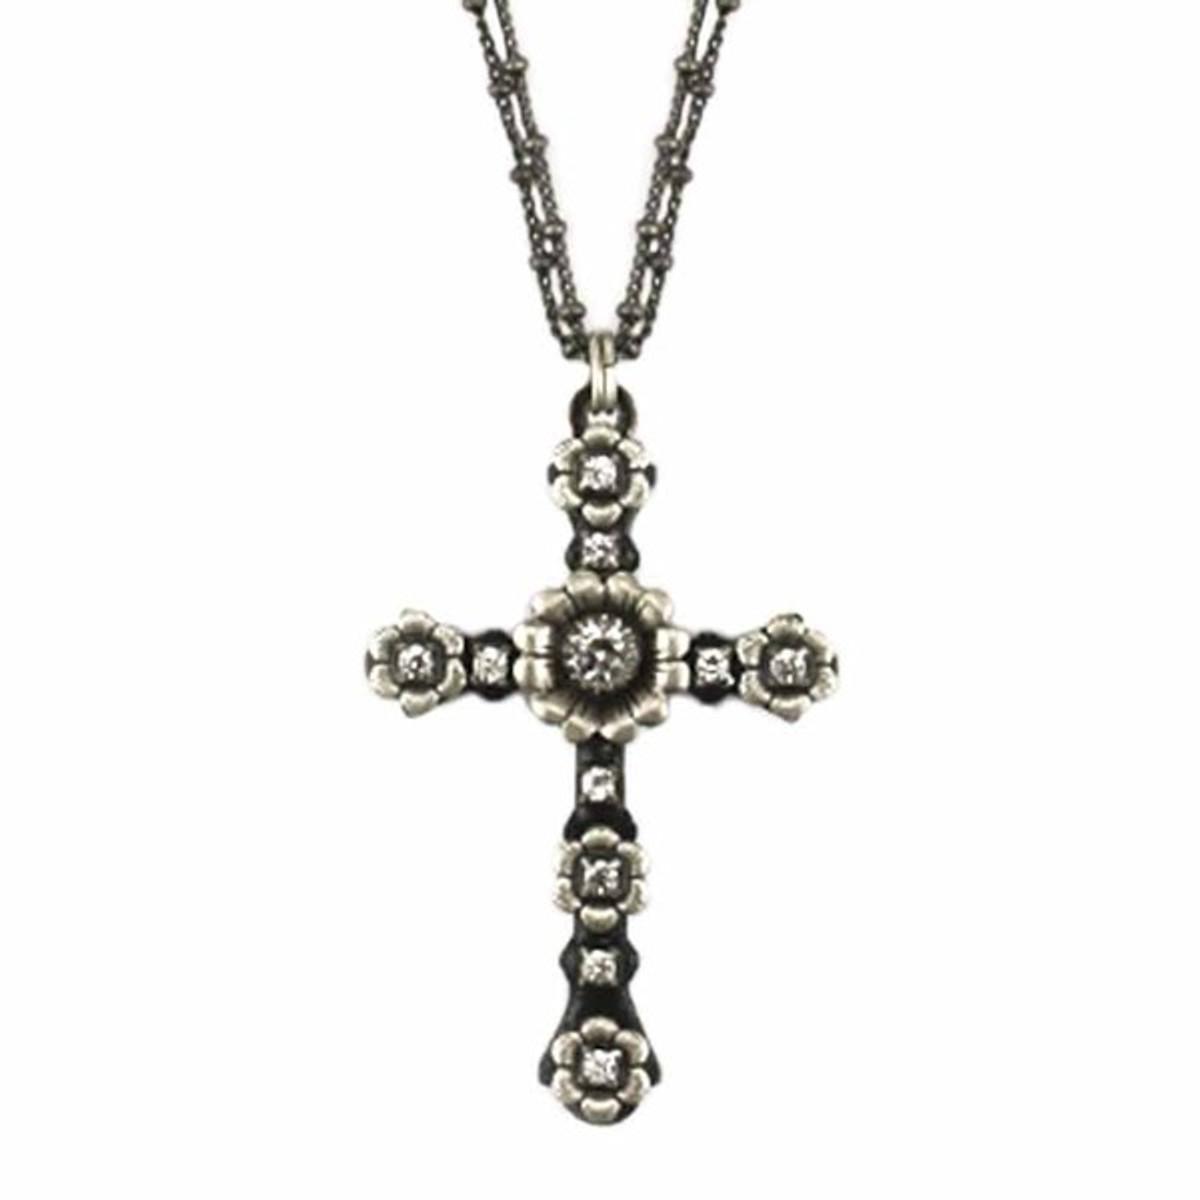 Black Floral Cross Necklace